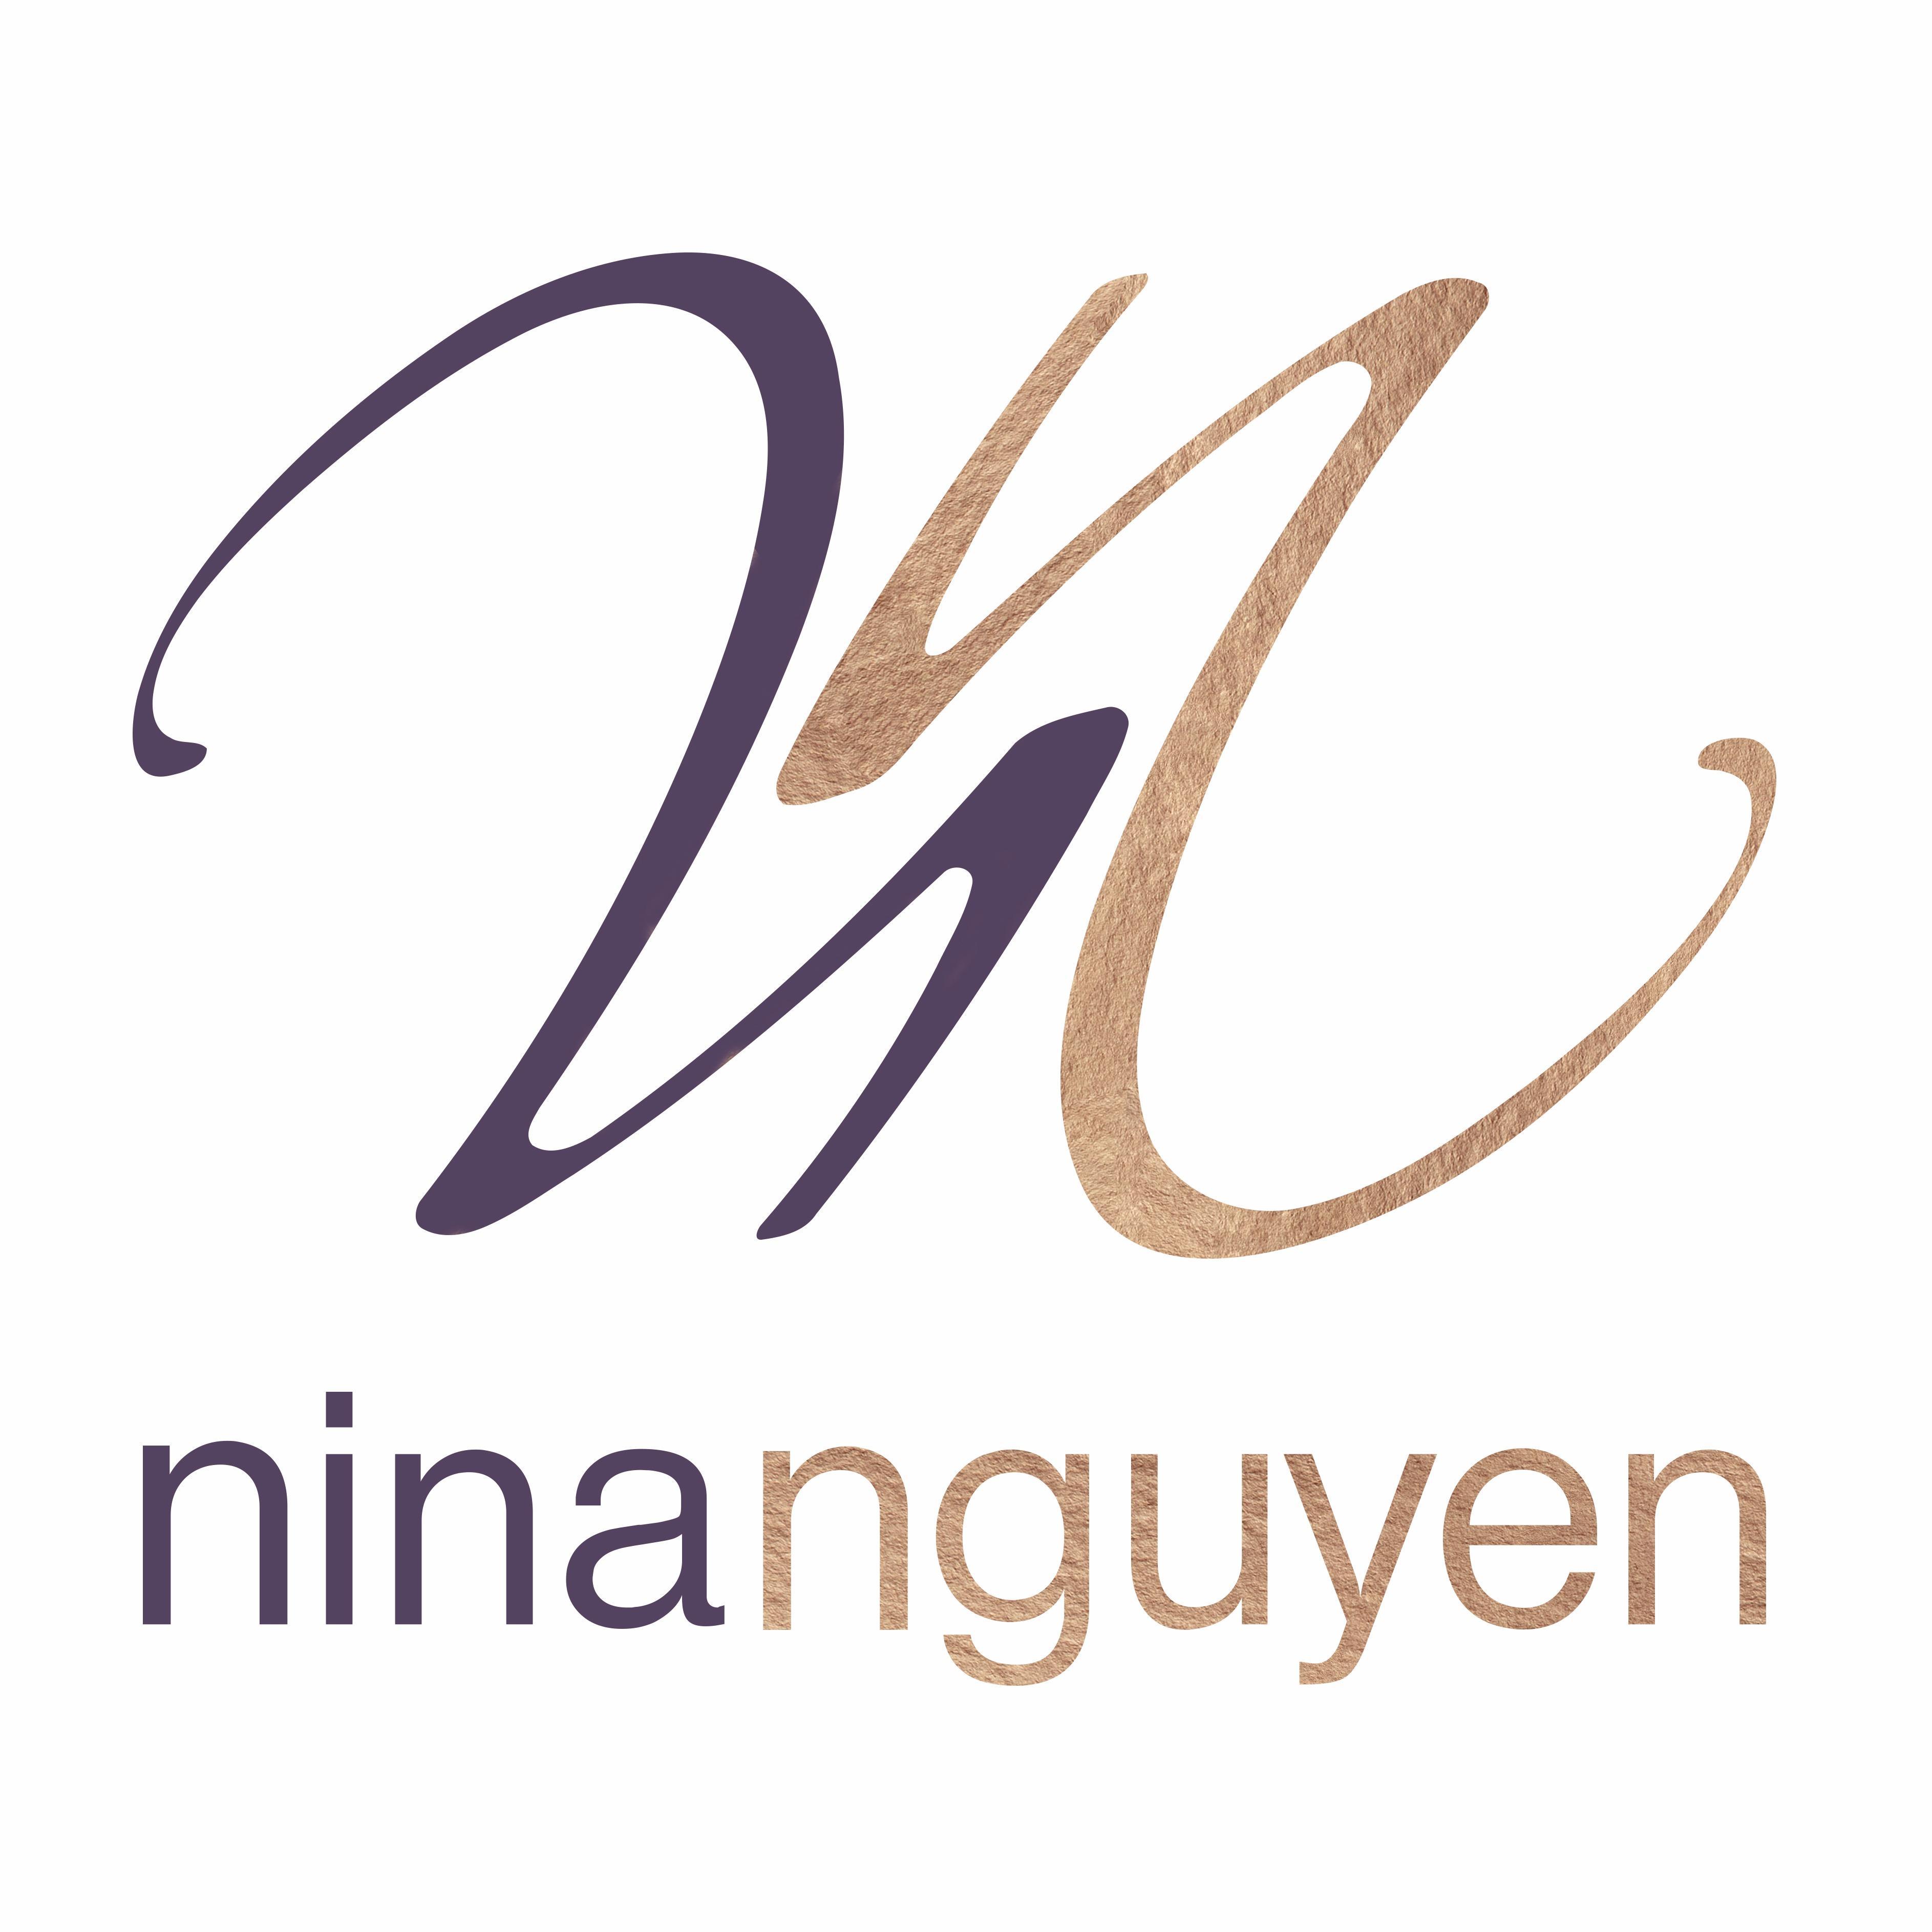 Nina Nguyen Designs